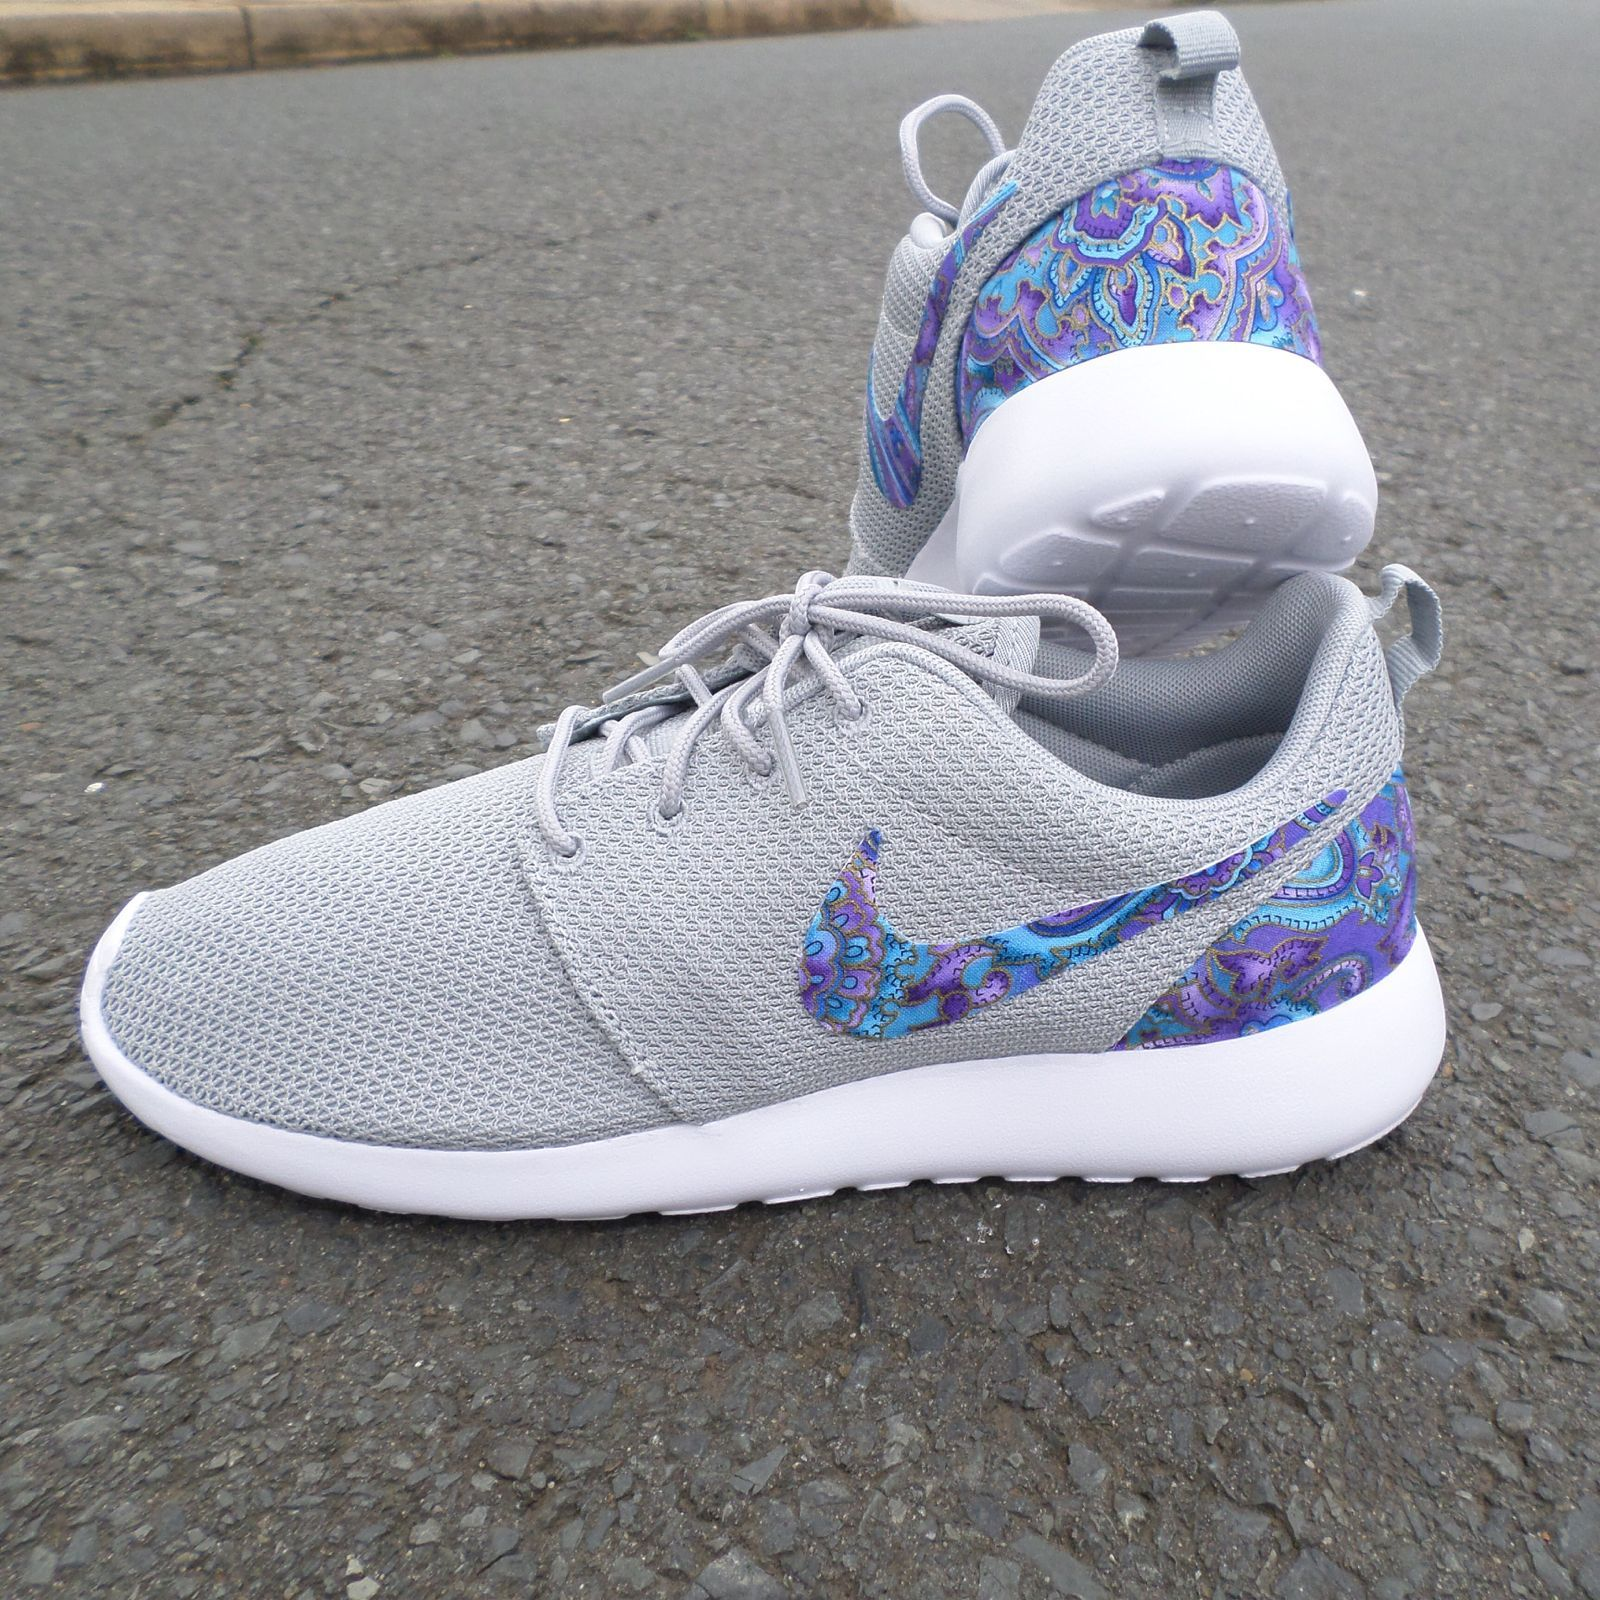 Custom Nike Roshe One Teal Purple Paisley / Customs x Cario ...